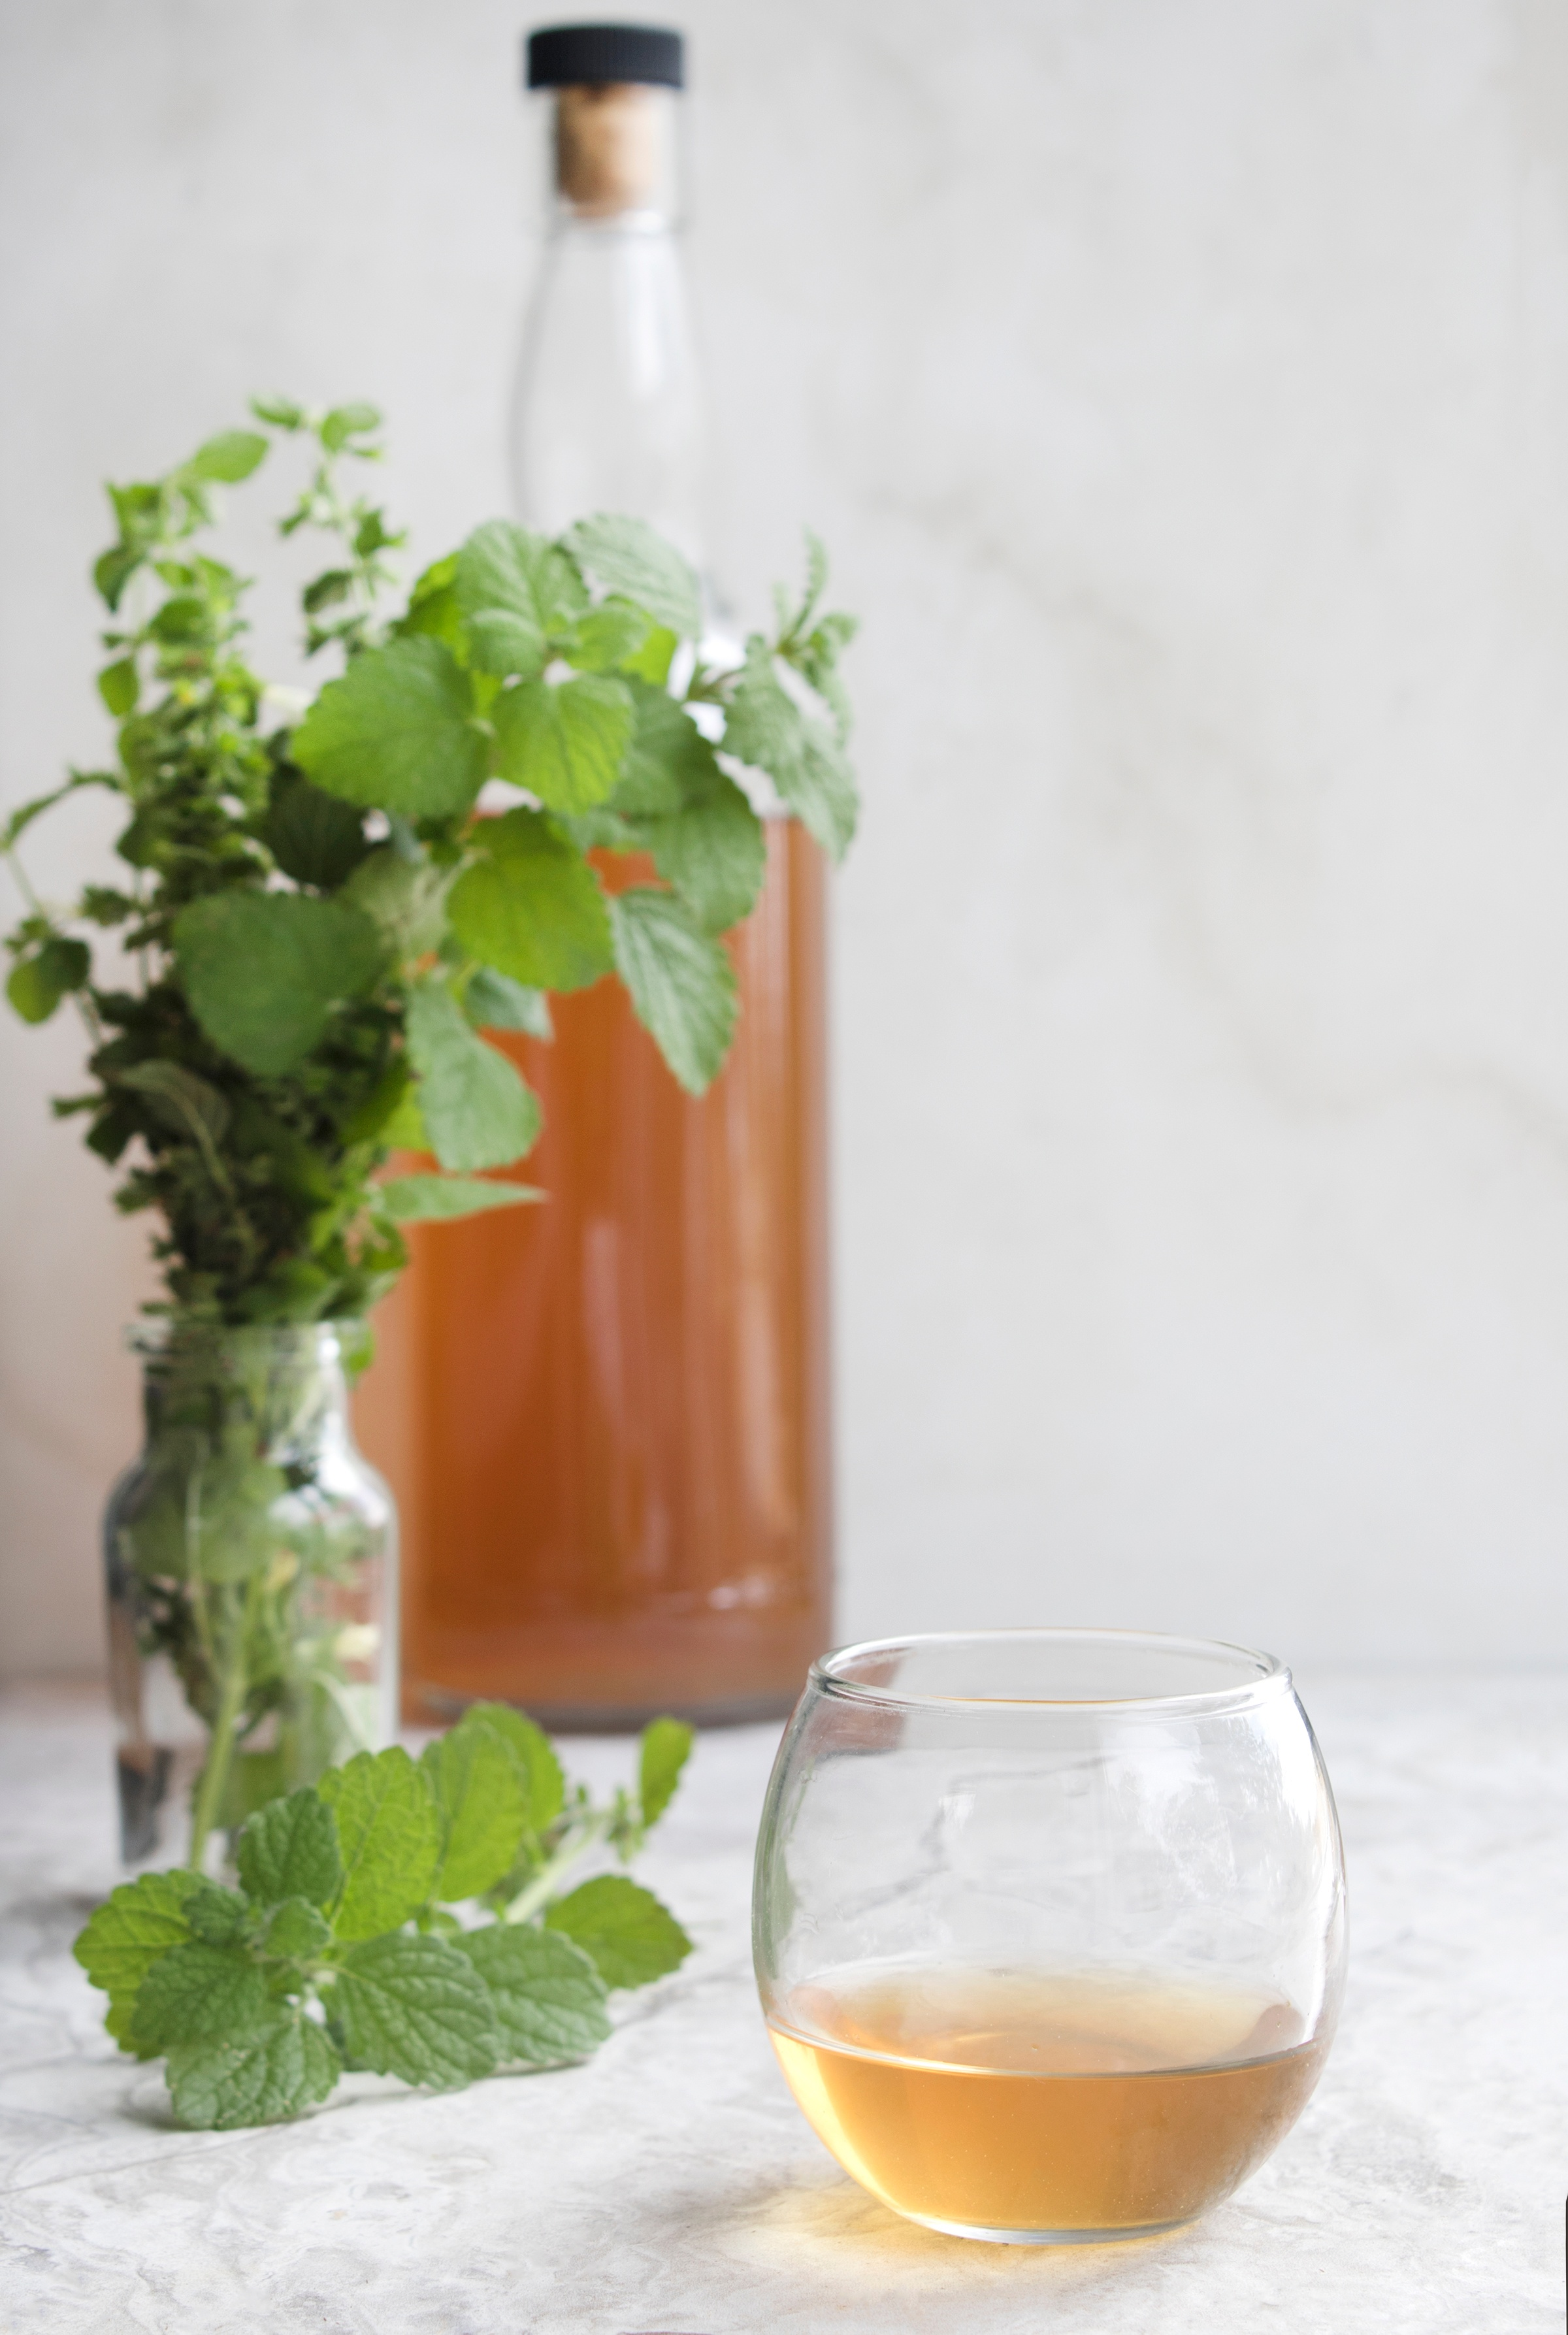 Clear globe glass holding Carmelite water near fresh lemon balm with bottle of amber liquid behind